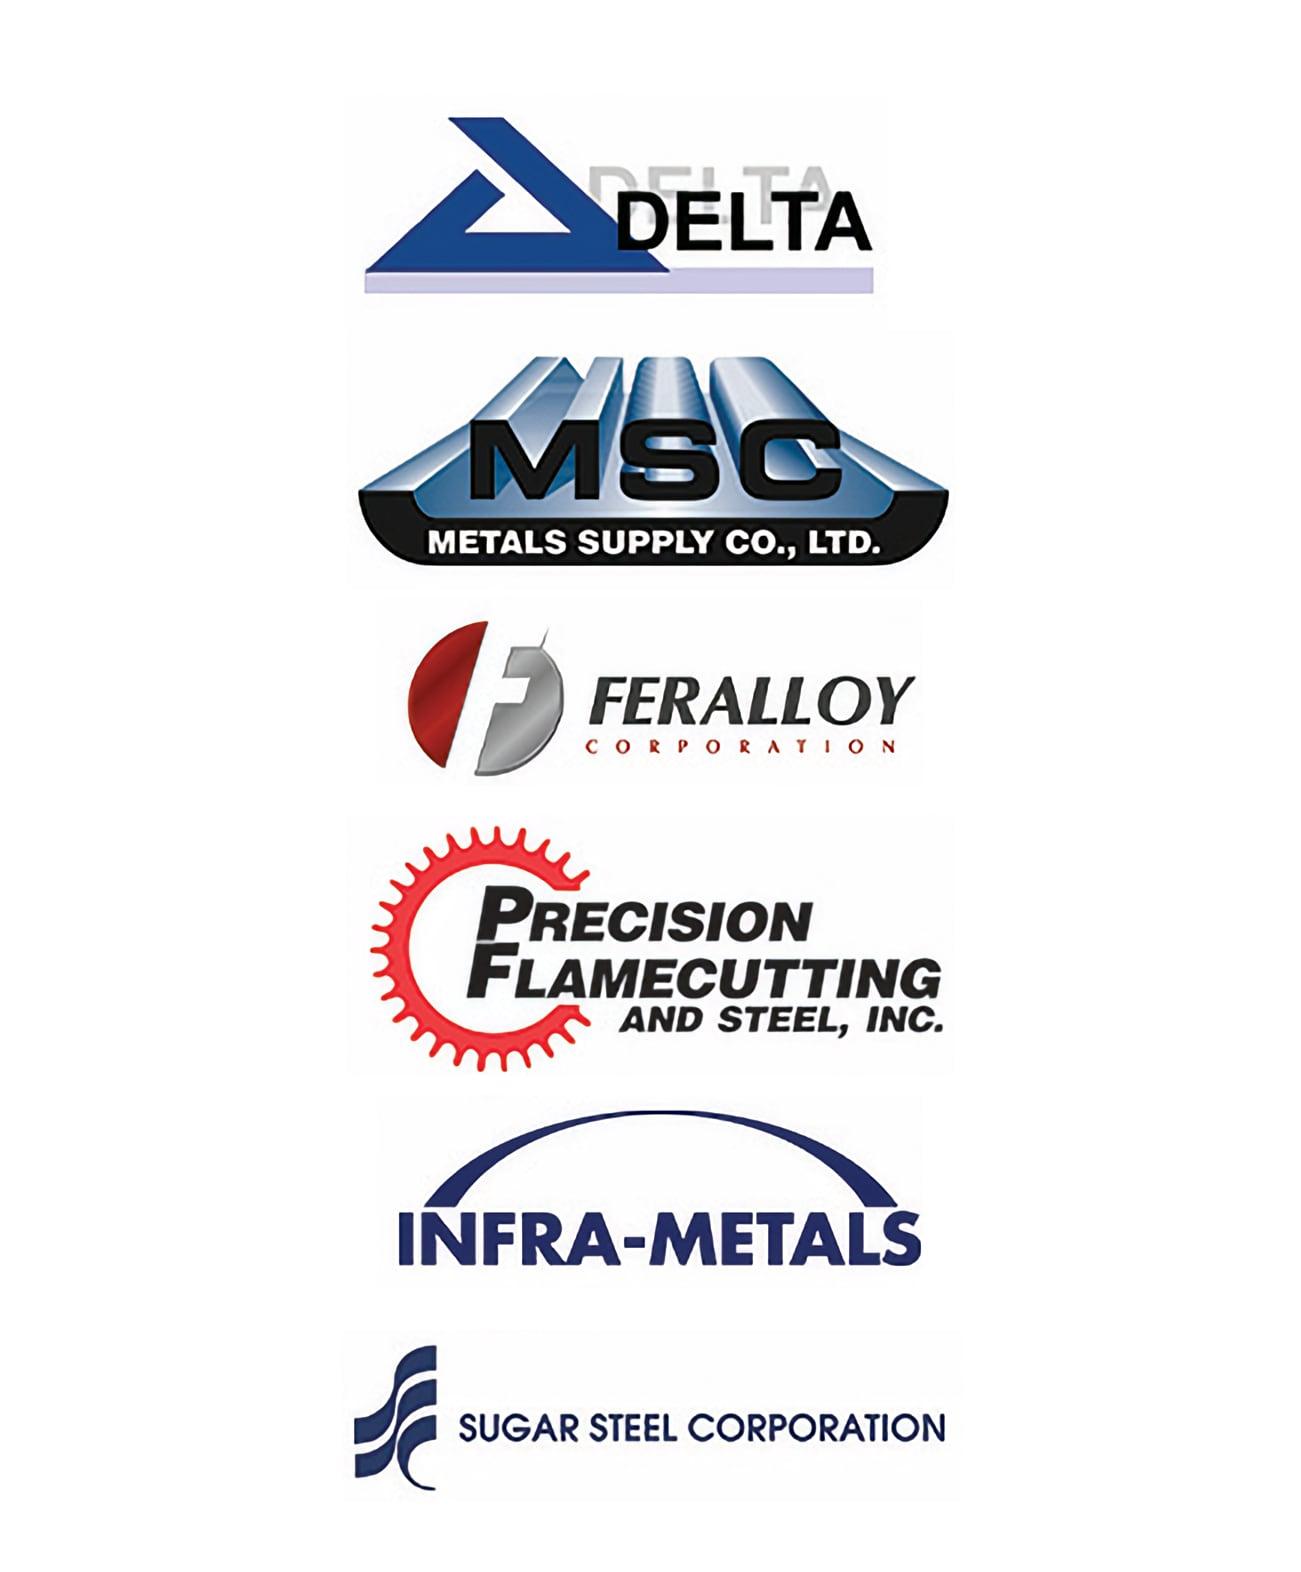 Reliance Steel Companies